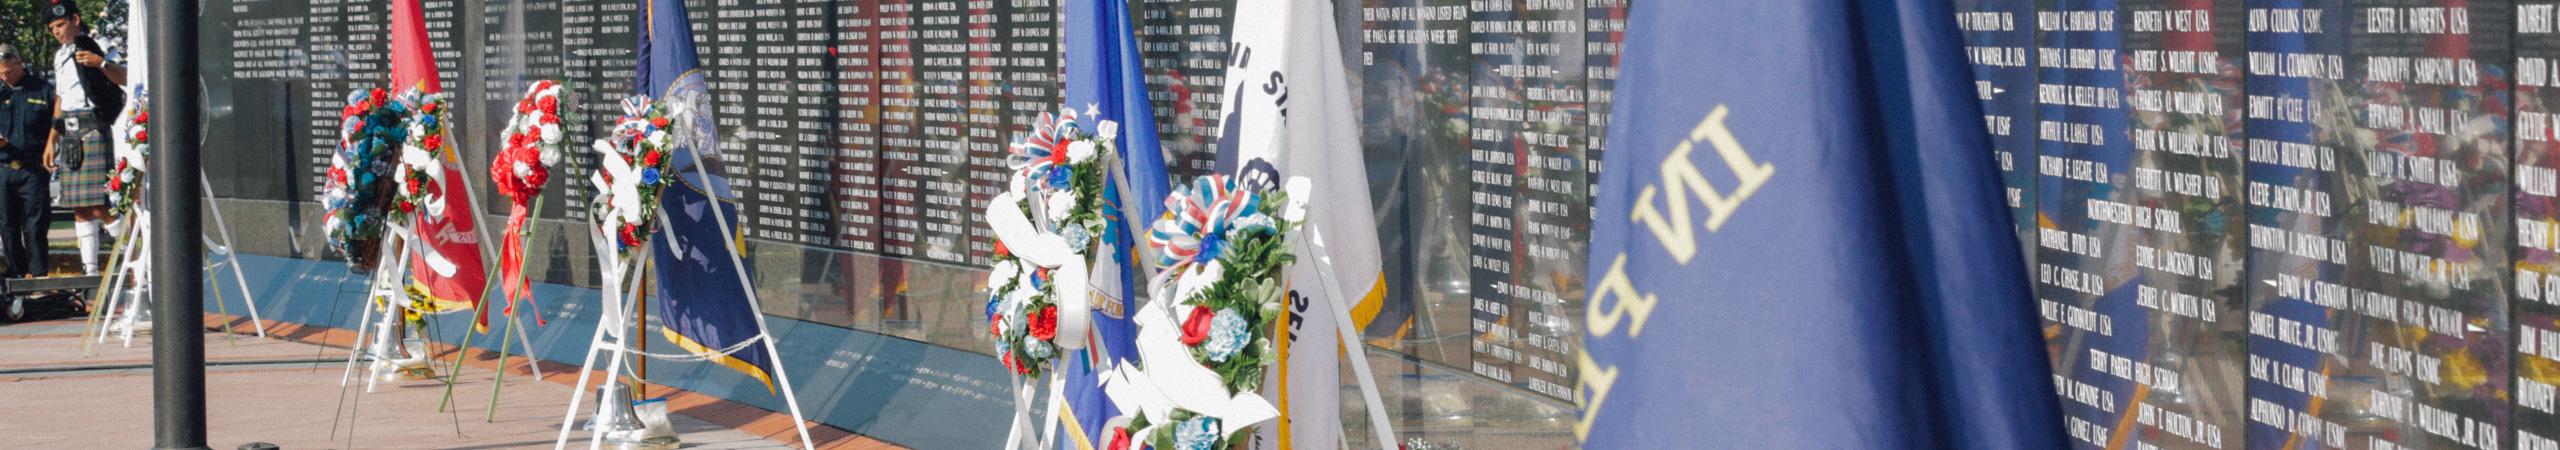 Memorial Wall Ceremony 2019